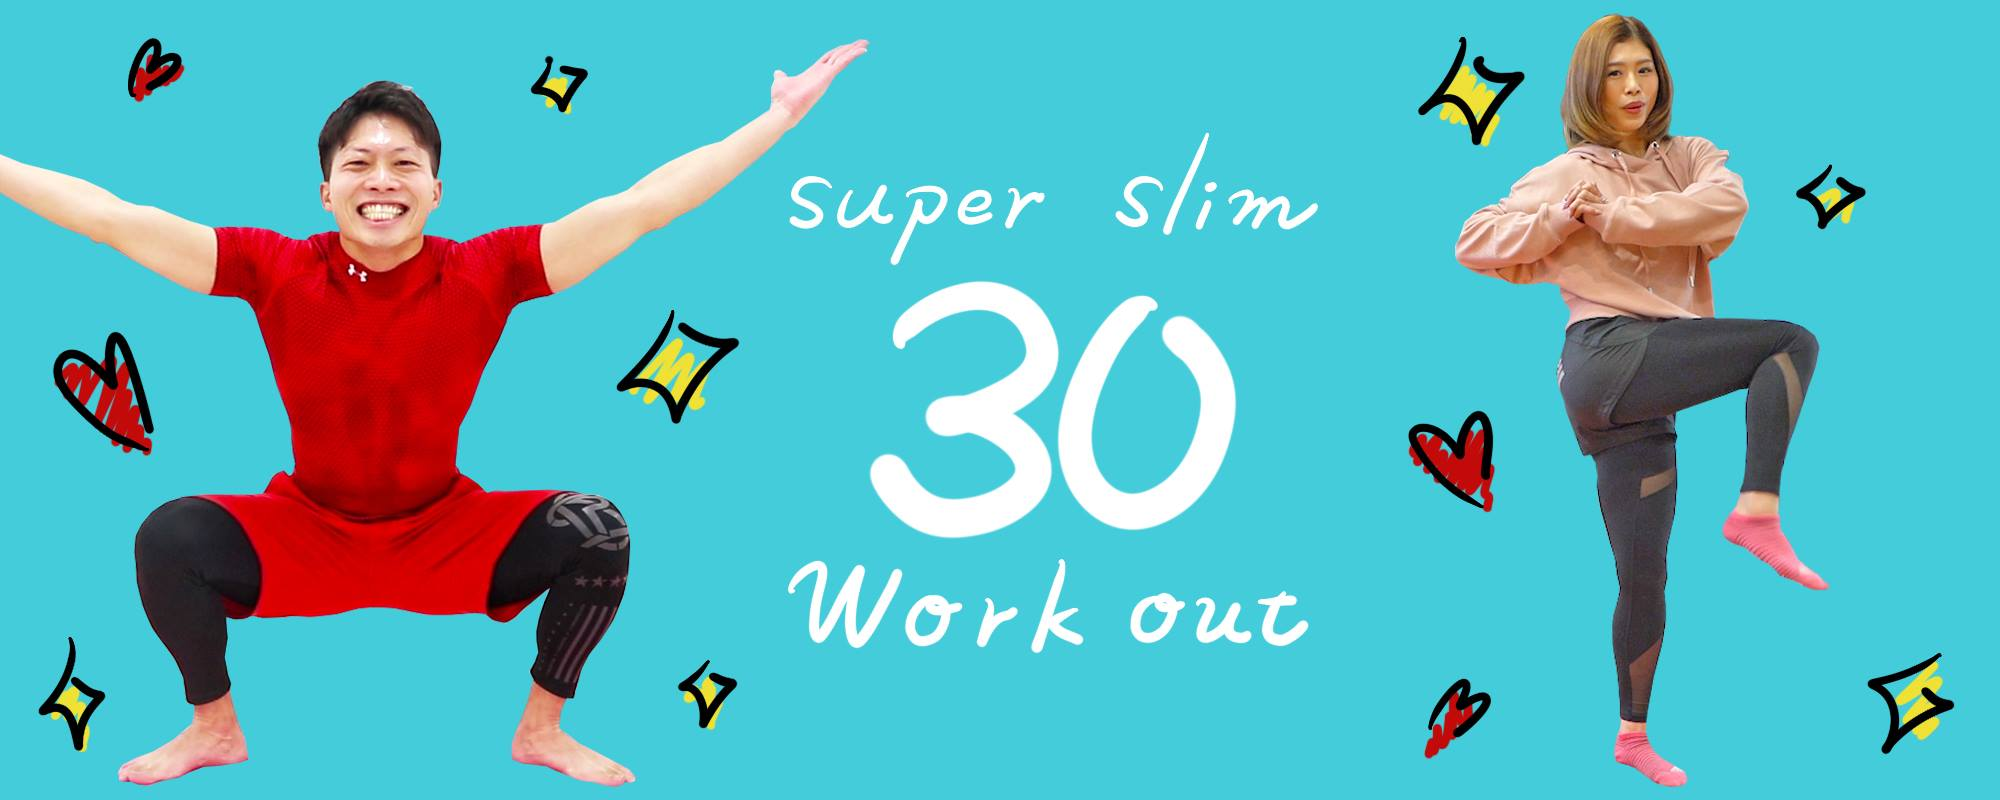 30 min workout 3 weeks program